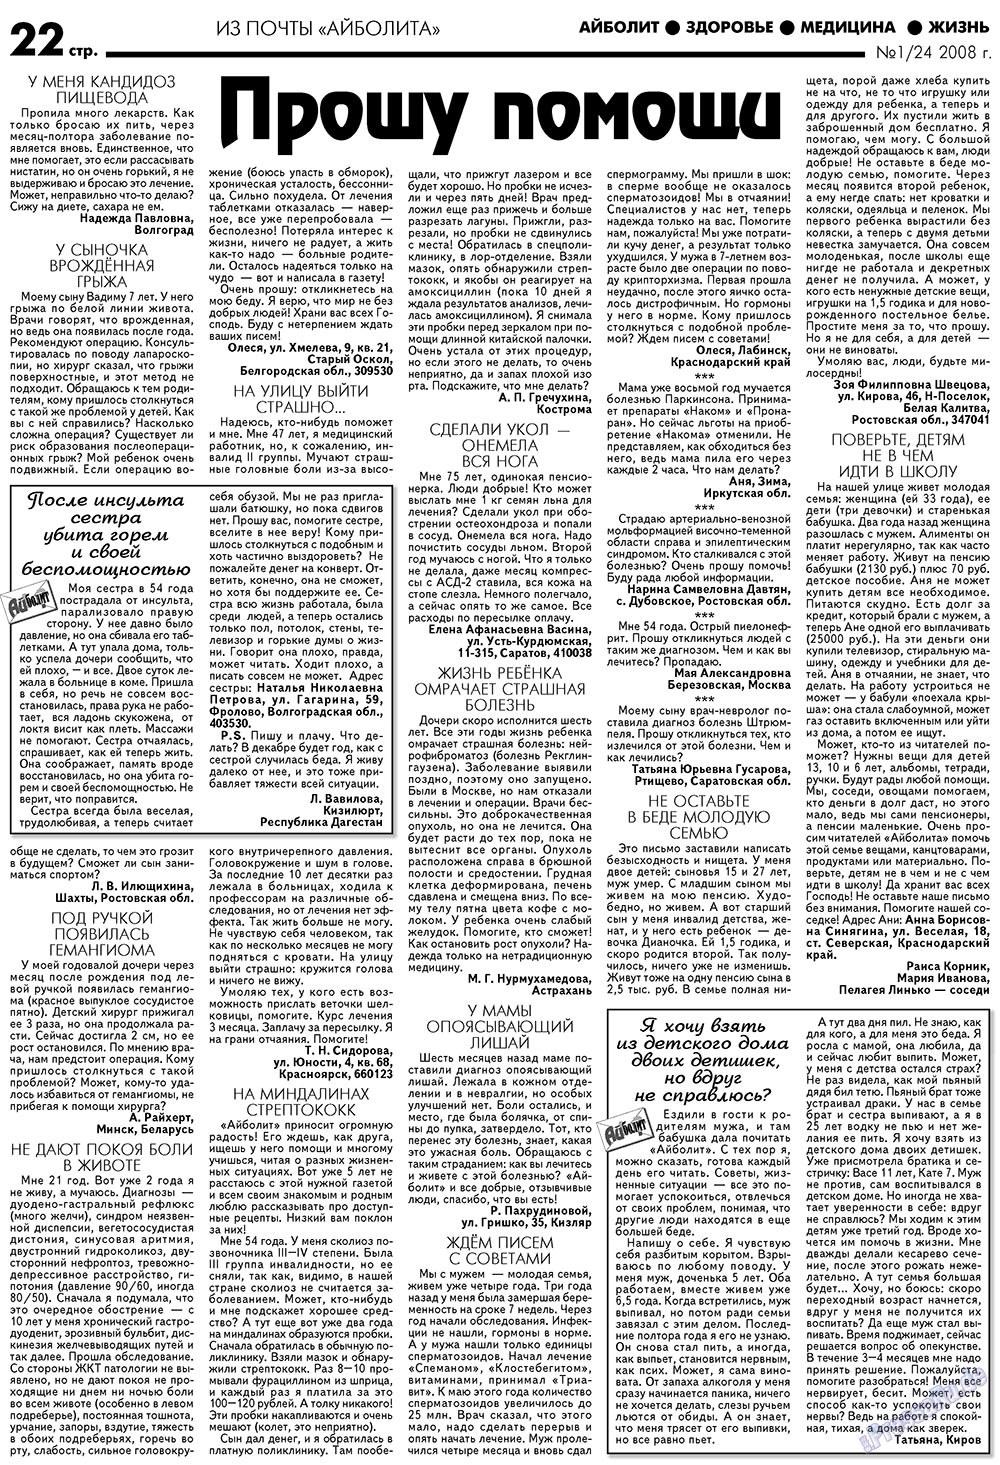 АйБолит (газета). 2008 год, номер 1, стр. 22